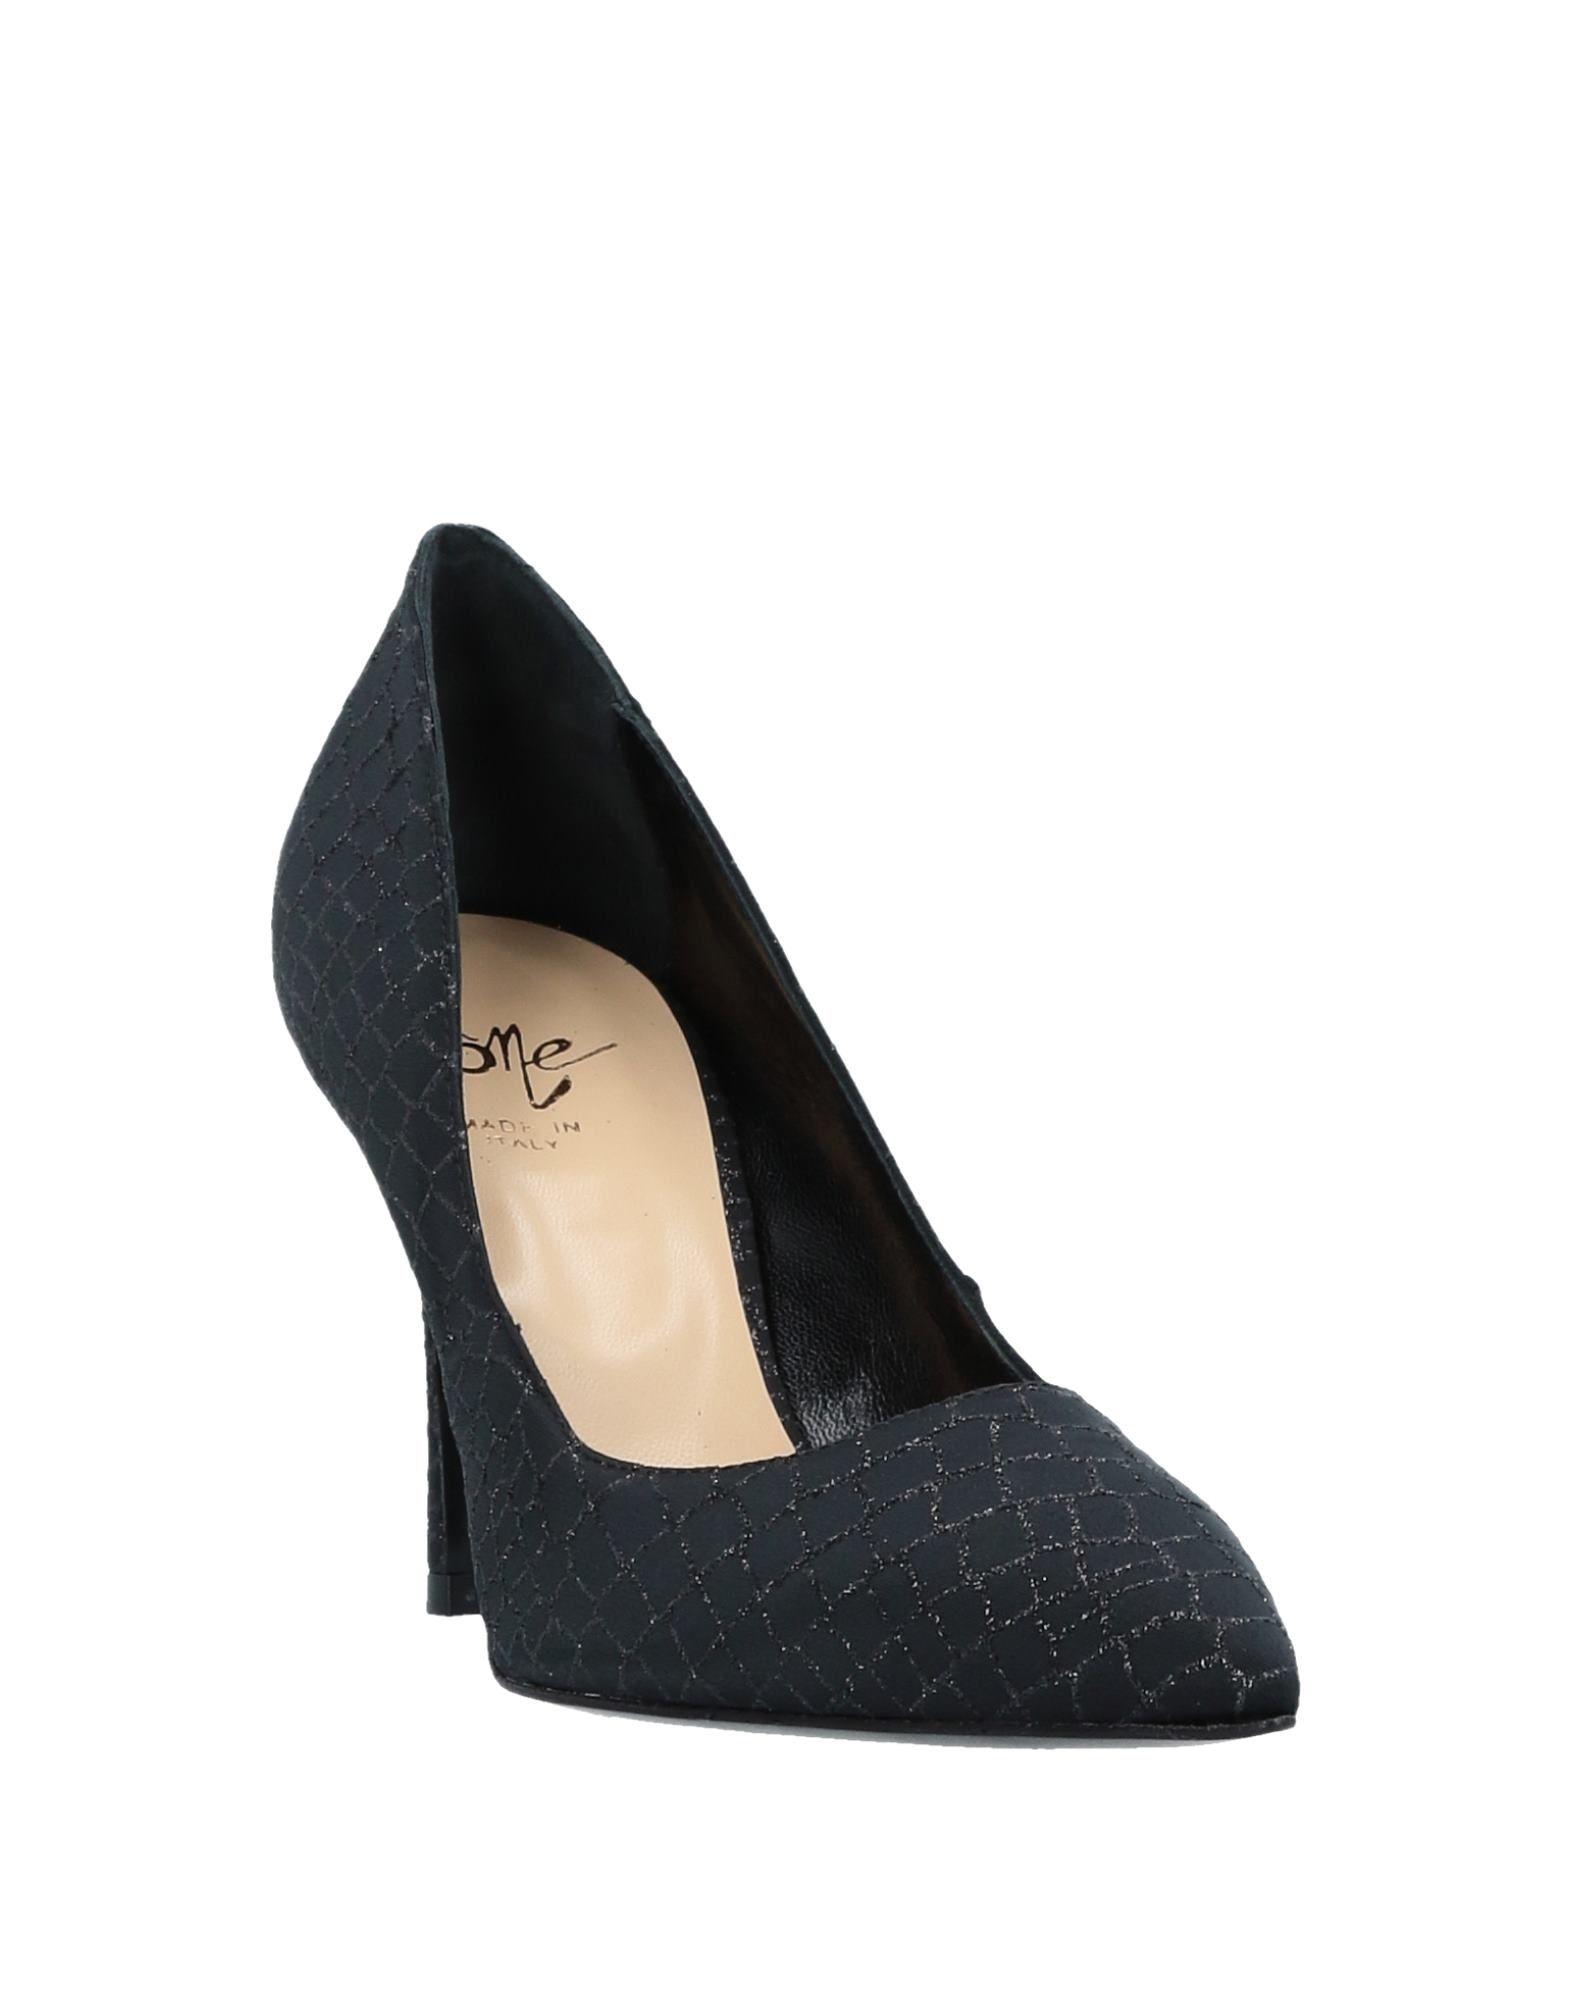 Stilvolle Stilvolle Stilvolle billige Schuhe Icône Pumps Damen  11521291DJ 47a66d